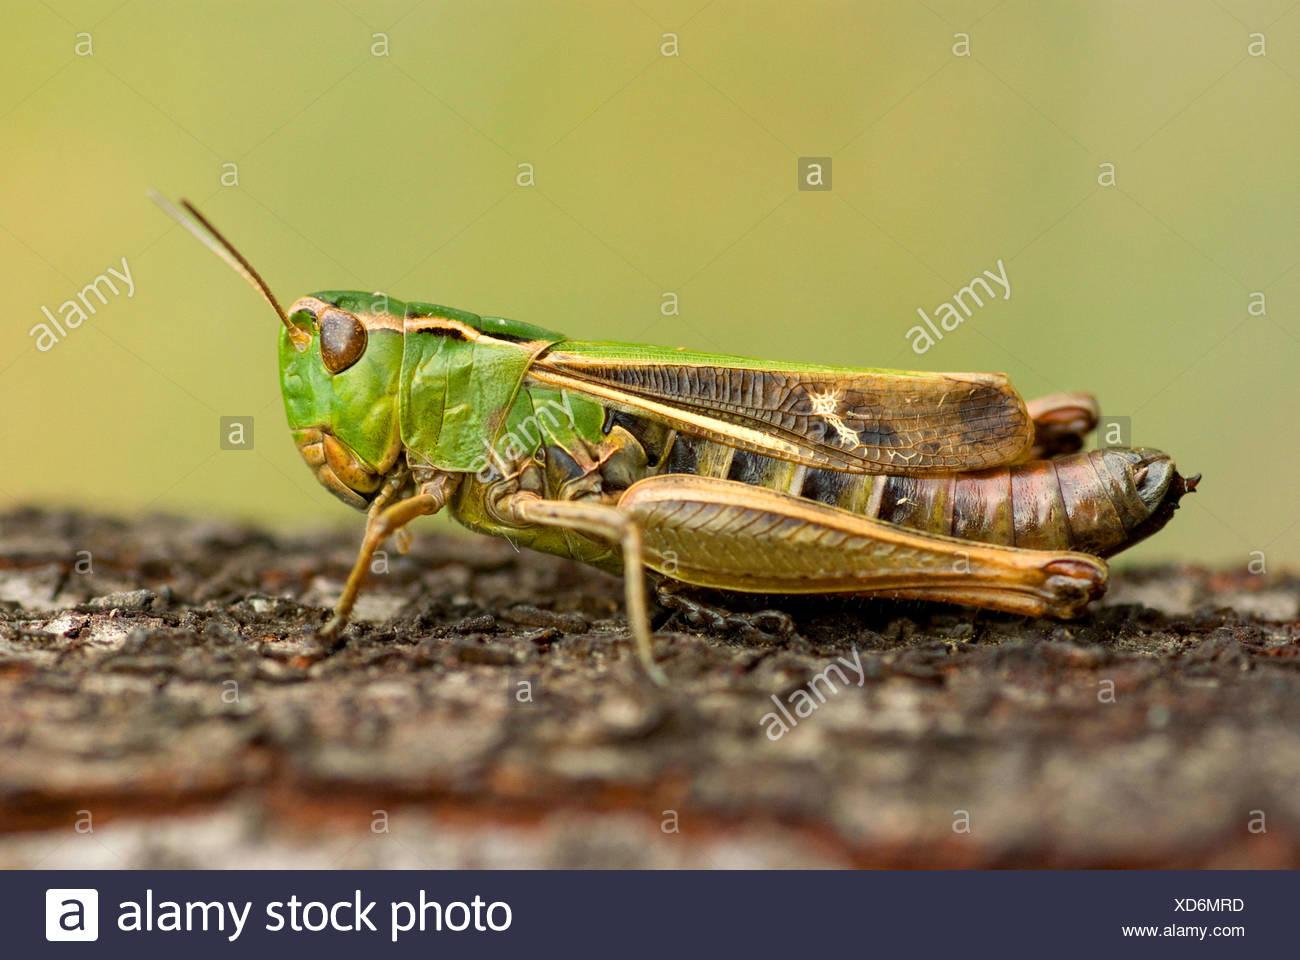 stripe-winged grasshopper, lined grasshopper (Stenobothrus lineatus), sitting on plant, Germany - Stock Image